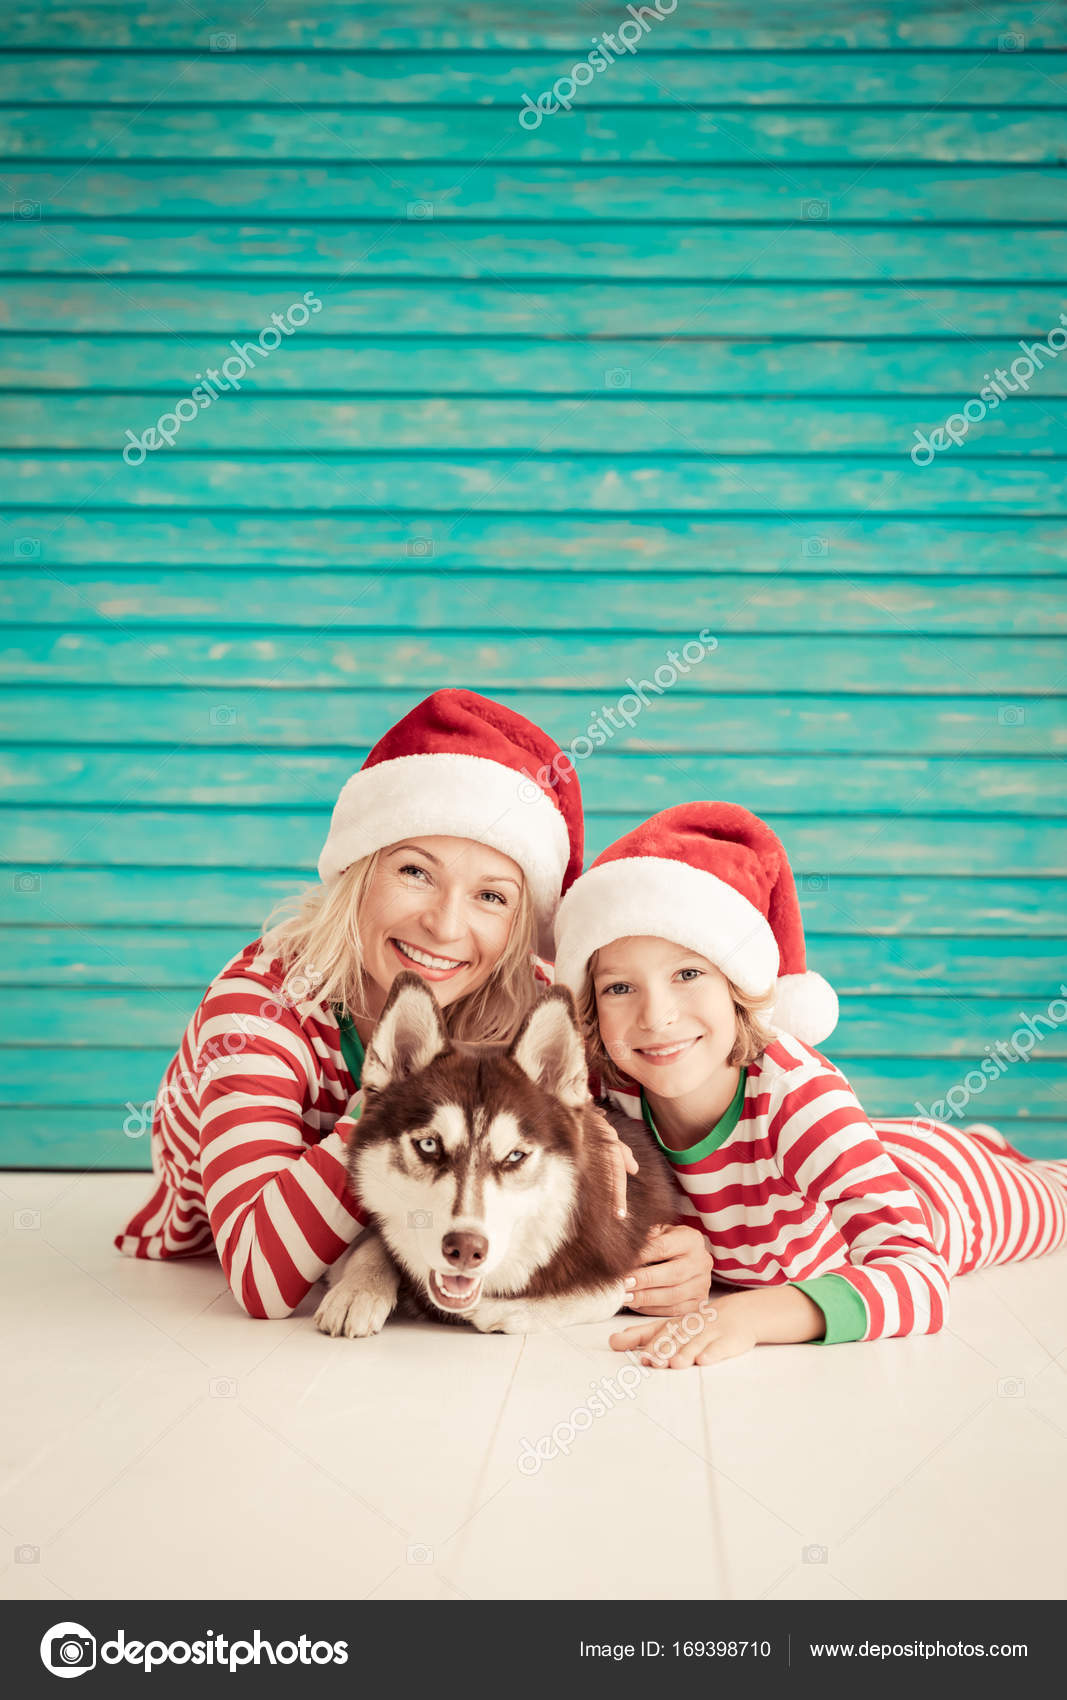 b41fdca05ea3 Ευτυχισμένη μητέρα με παιδί ντυμένος με Αϊ Βασίλη καπέλο και σκυλί που  ξαπλώνει στο πάτωμα την παραμονή των Χριστουγέννων